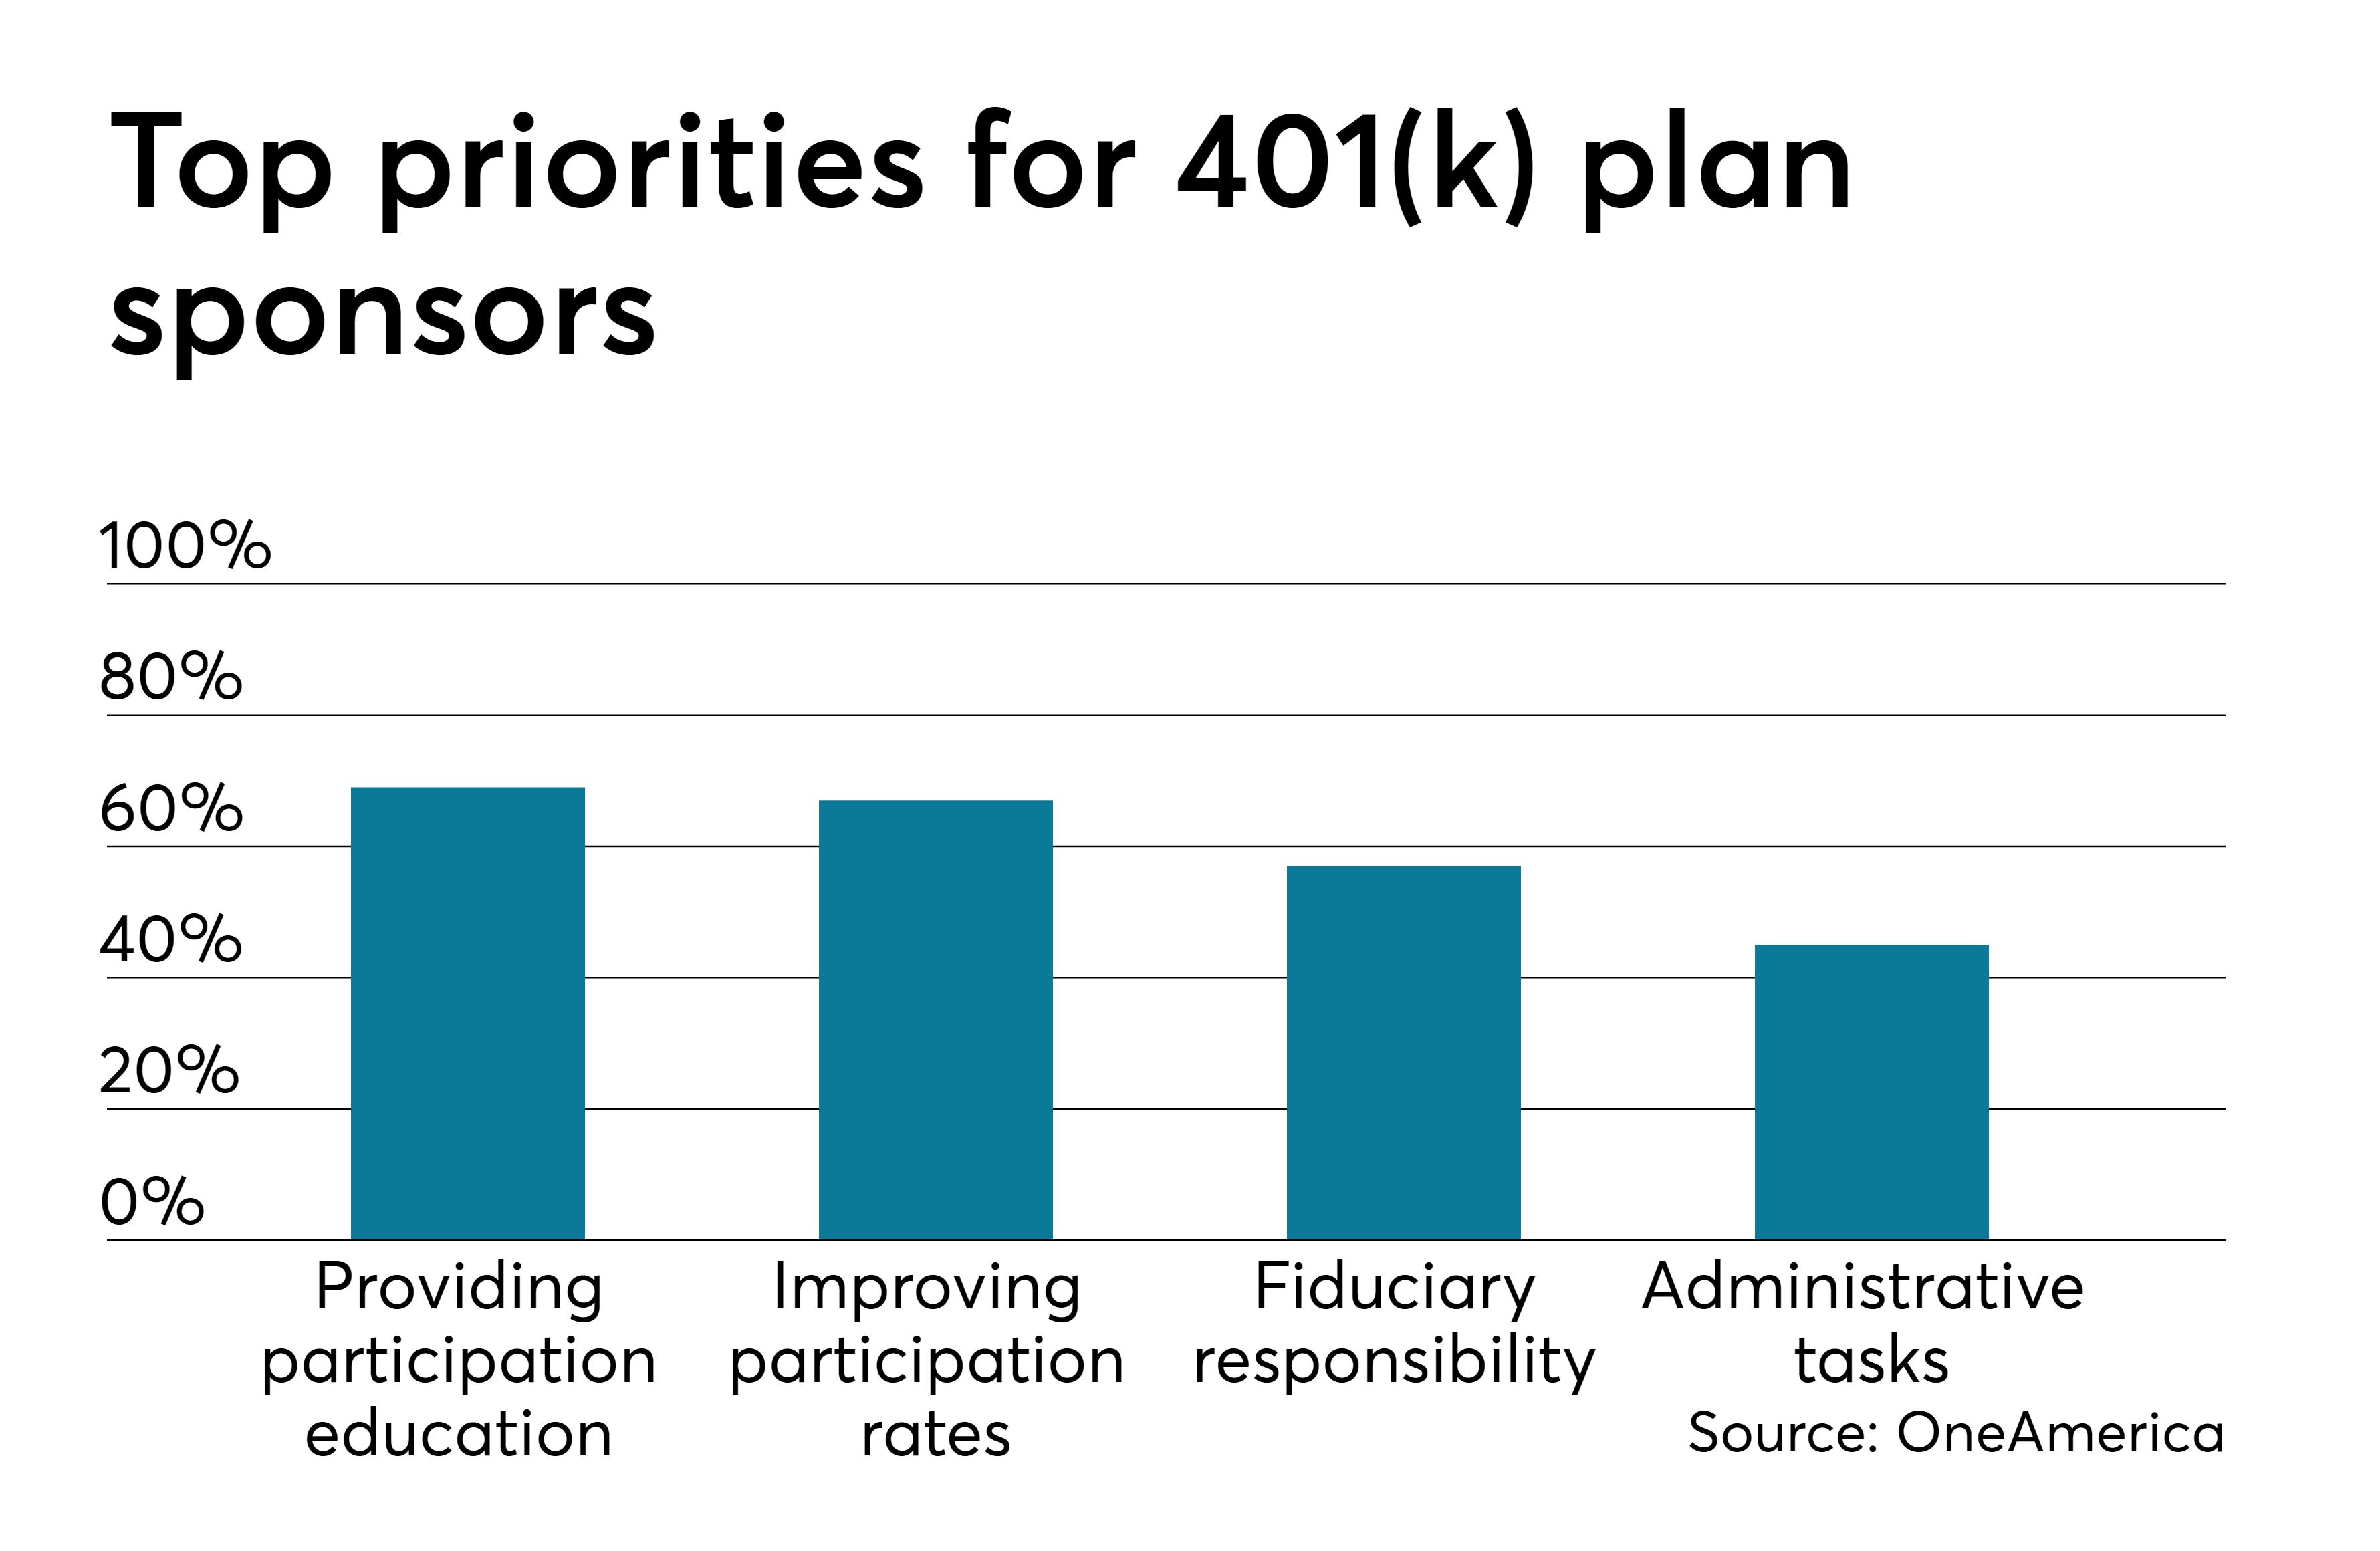 Helping Employers Build A Better 401k Retirement Plan